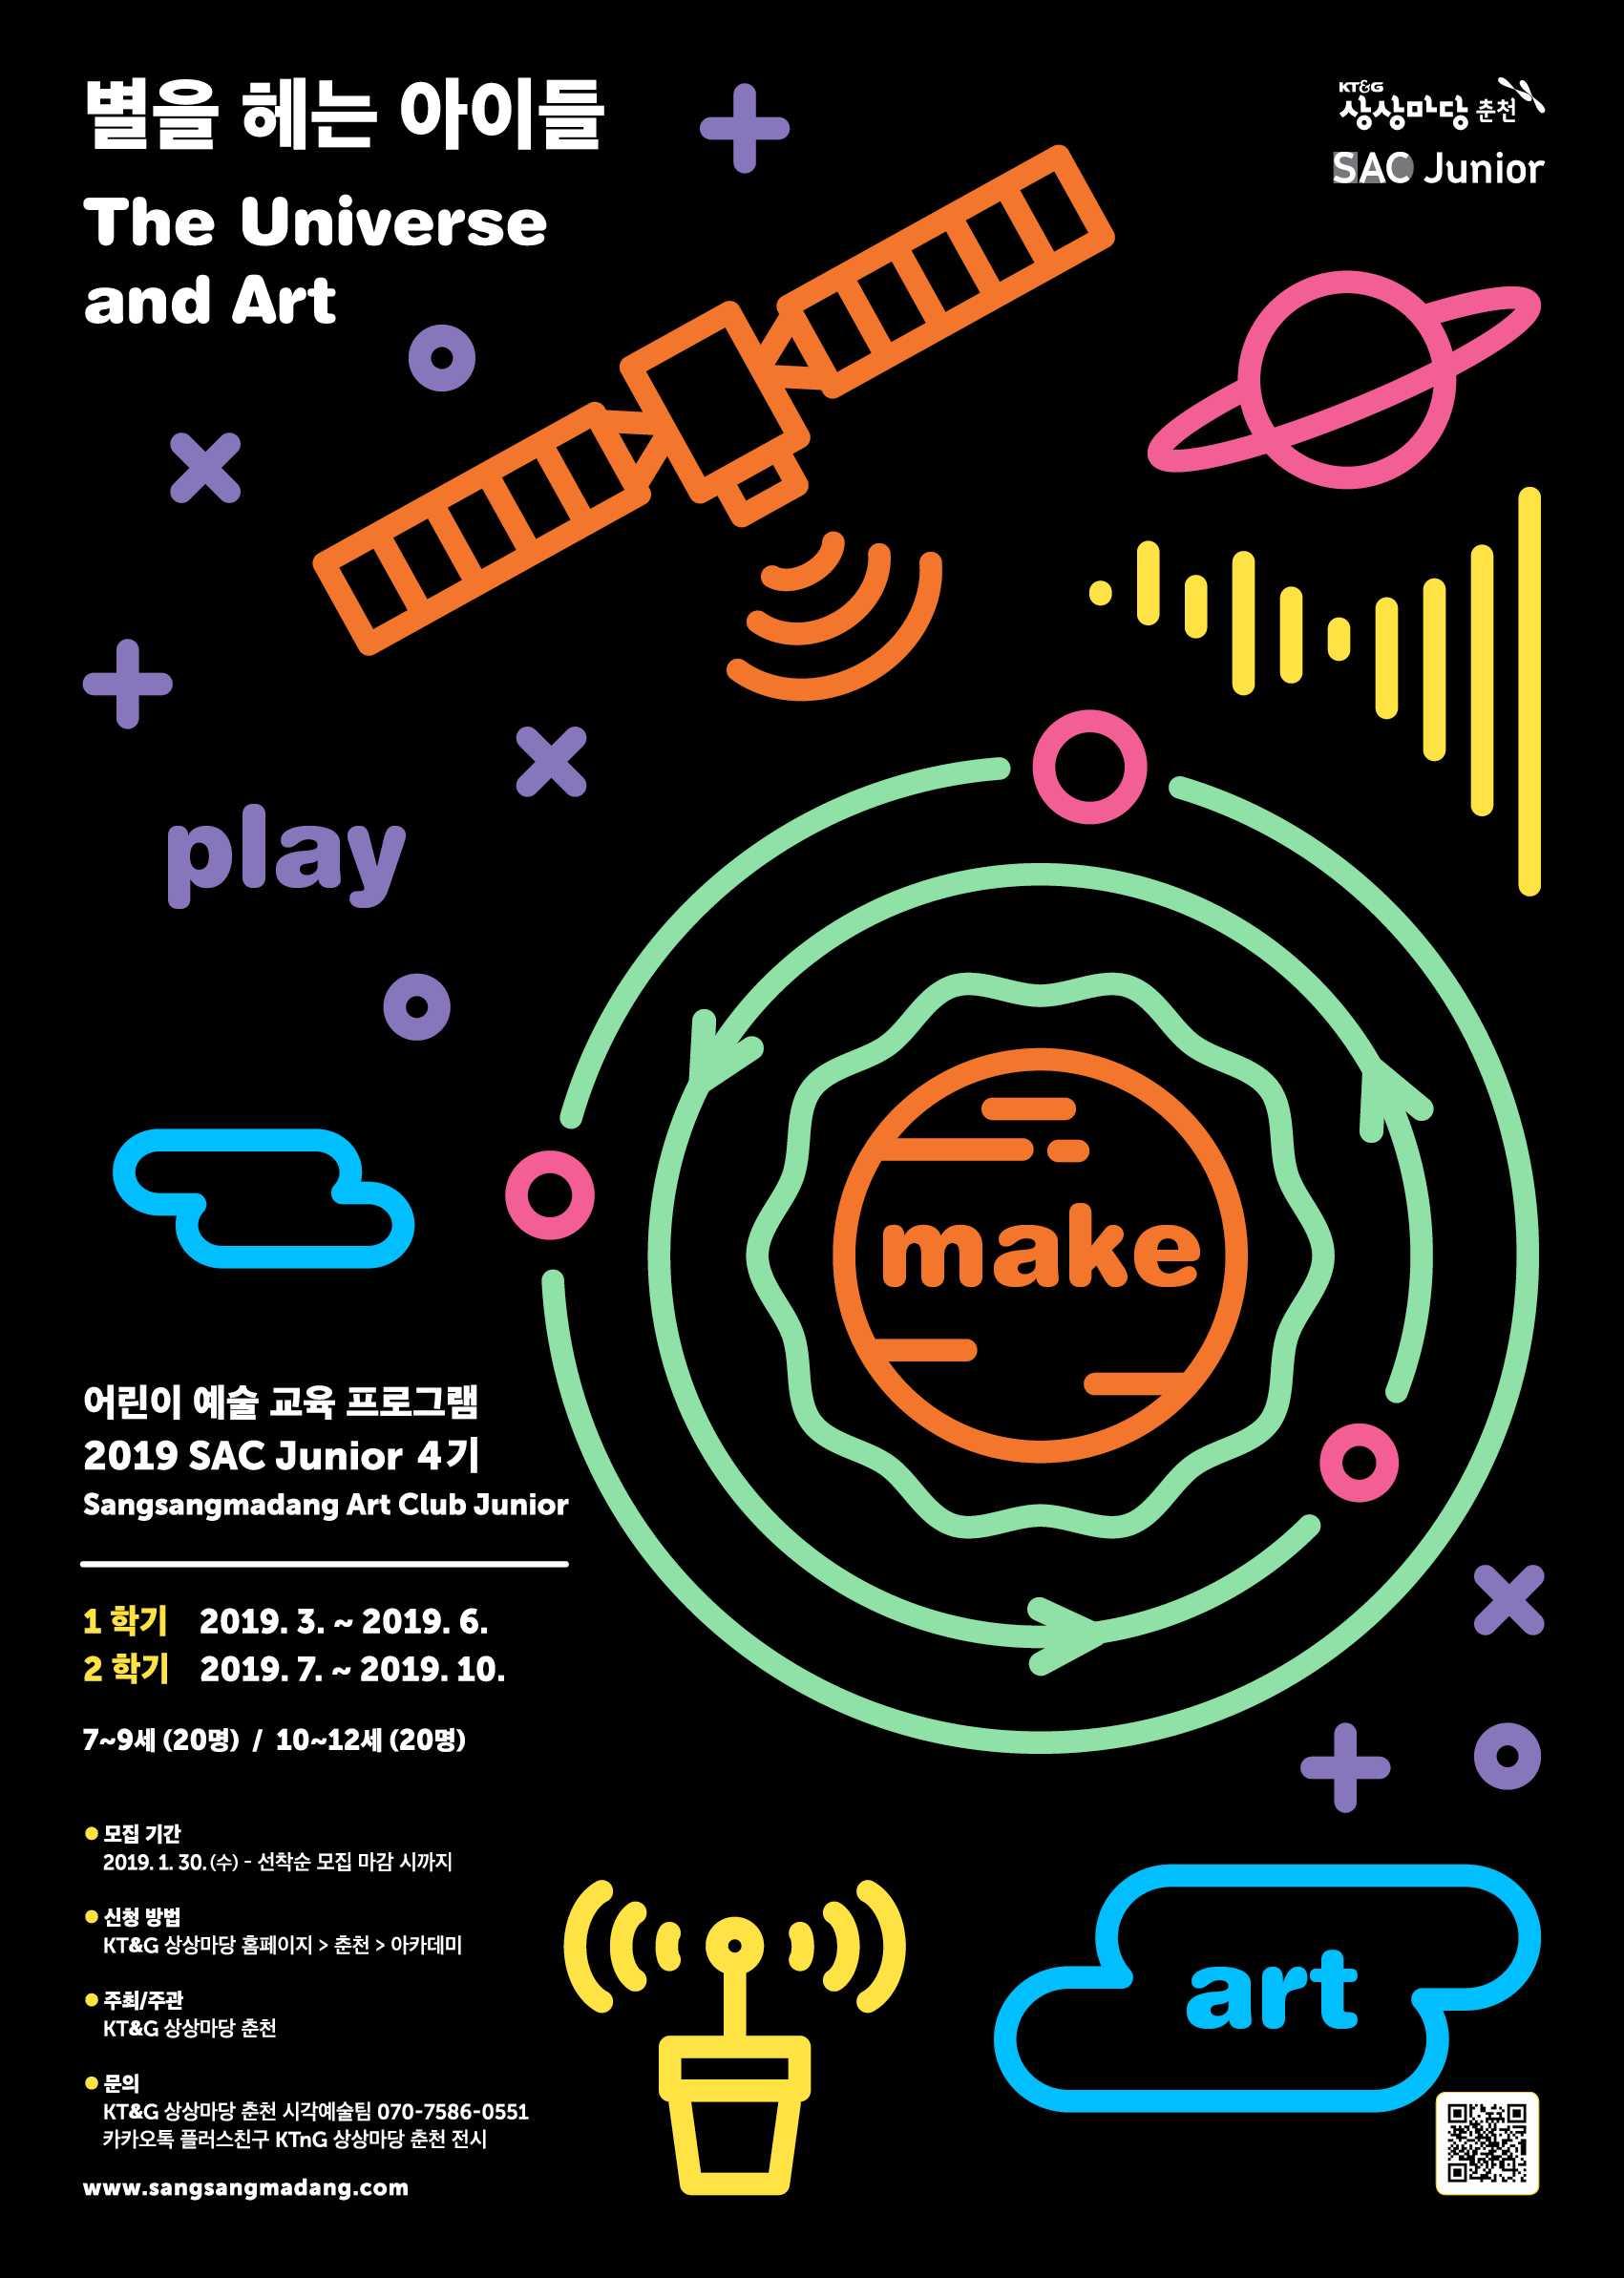 2019 <SAC Junior> 4기_1학기 (10-12세)